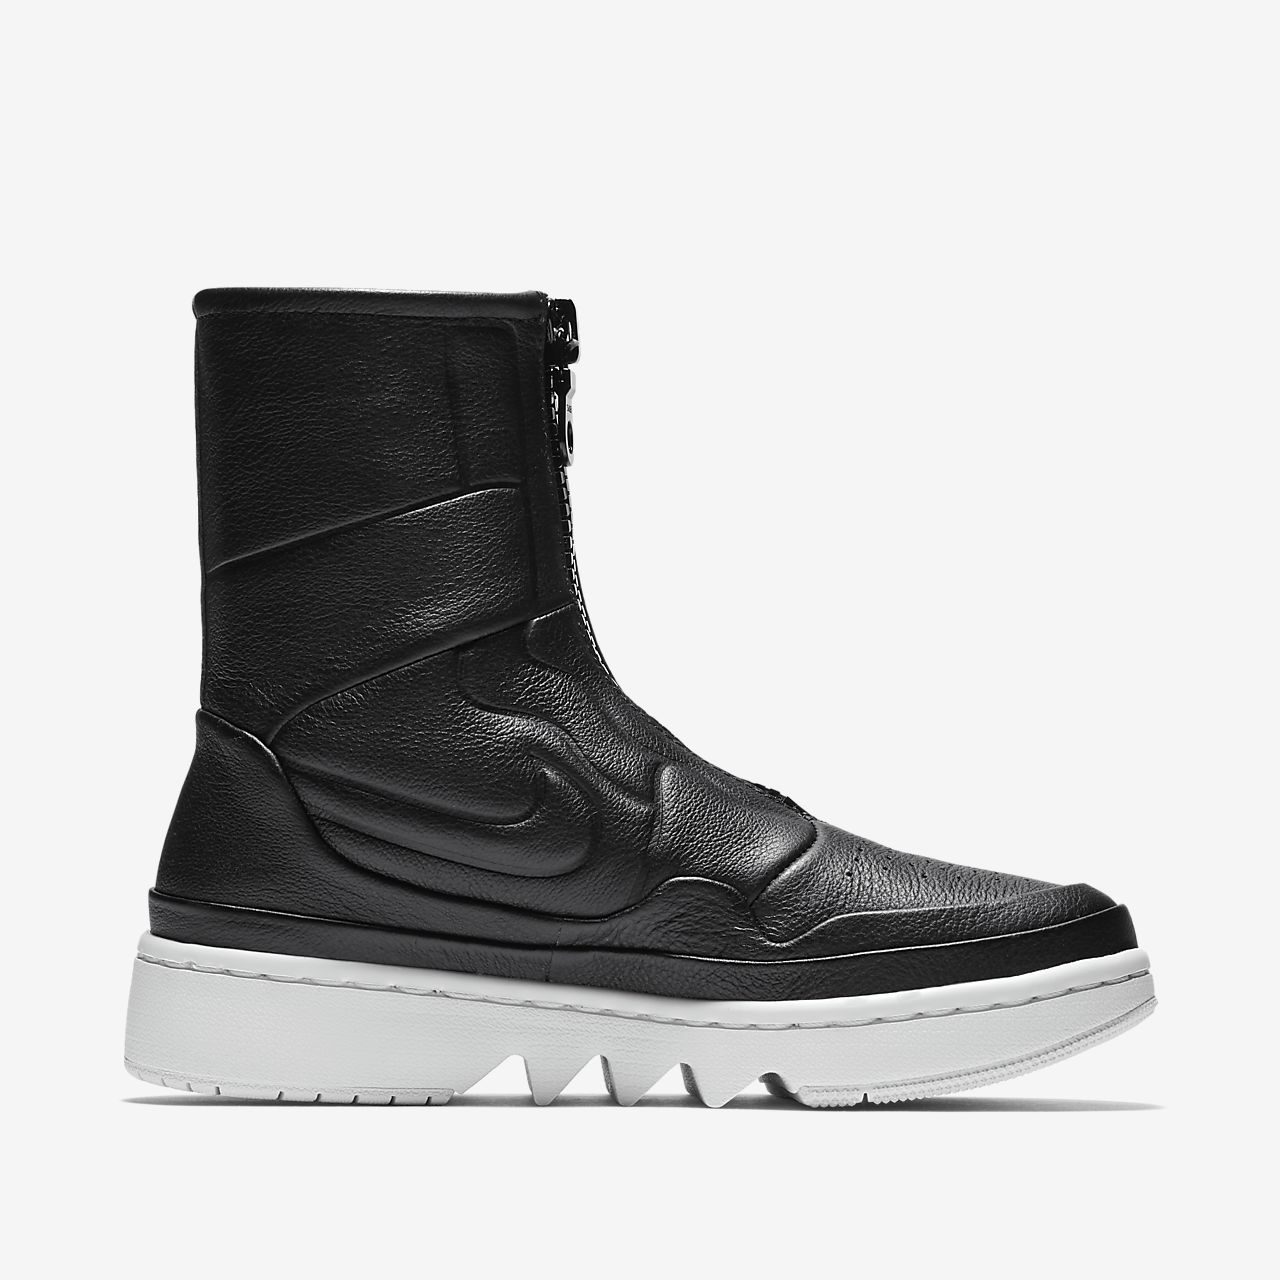 super popular 65211 84021 ... Air Jordan 1 Jester XX Women s Shoe